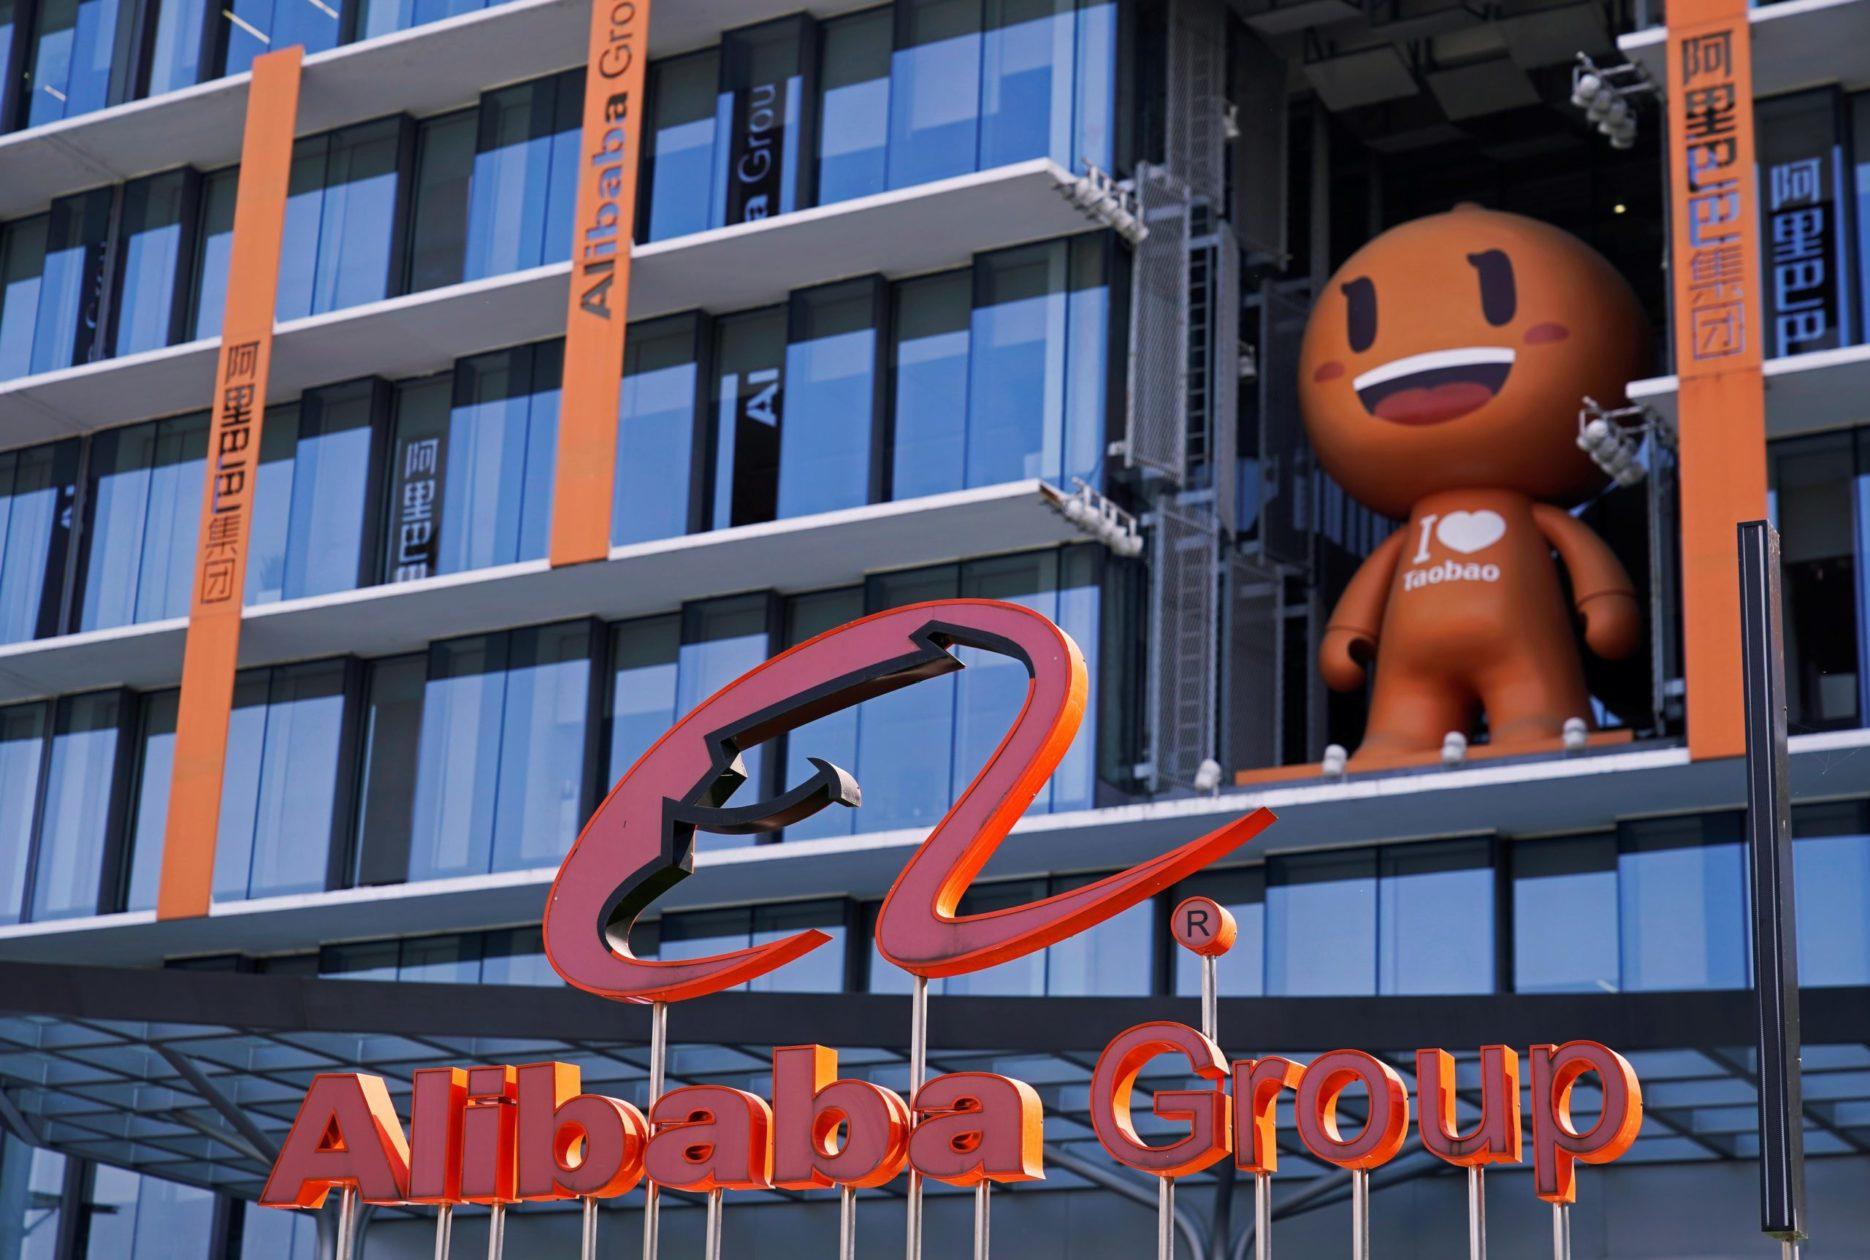 Alibaba Group faces record fine. Credit: Alibaba